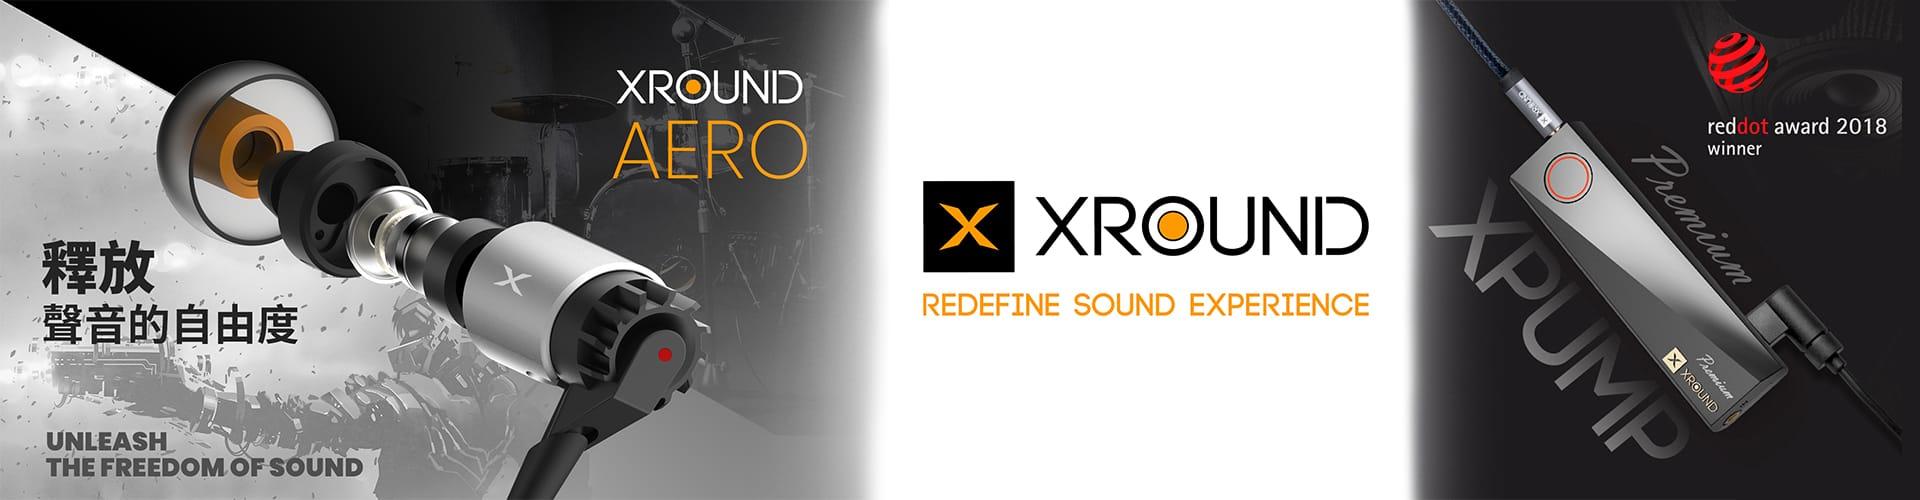 Xround 影音系列